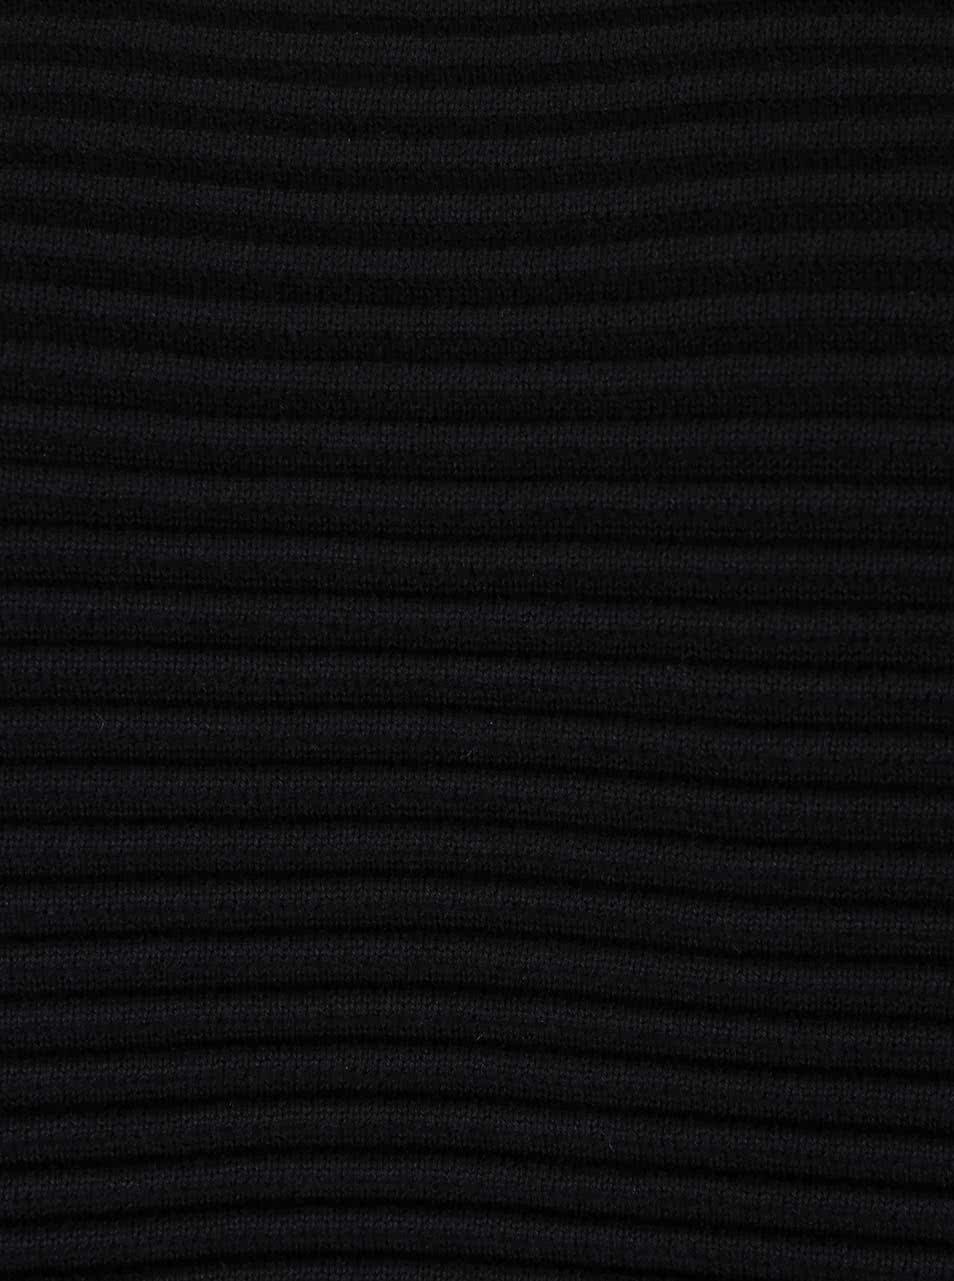 158dcff4026 Černý dámský svetr Bench Wonderlust ...